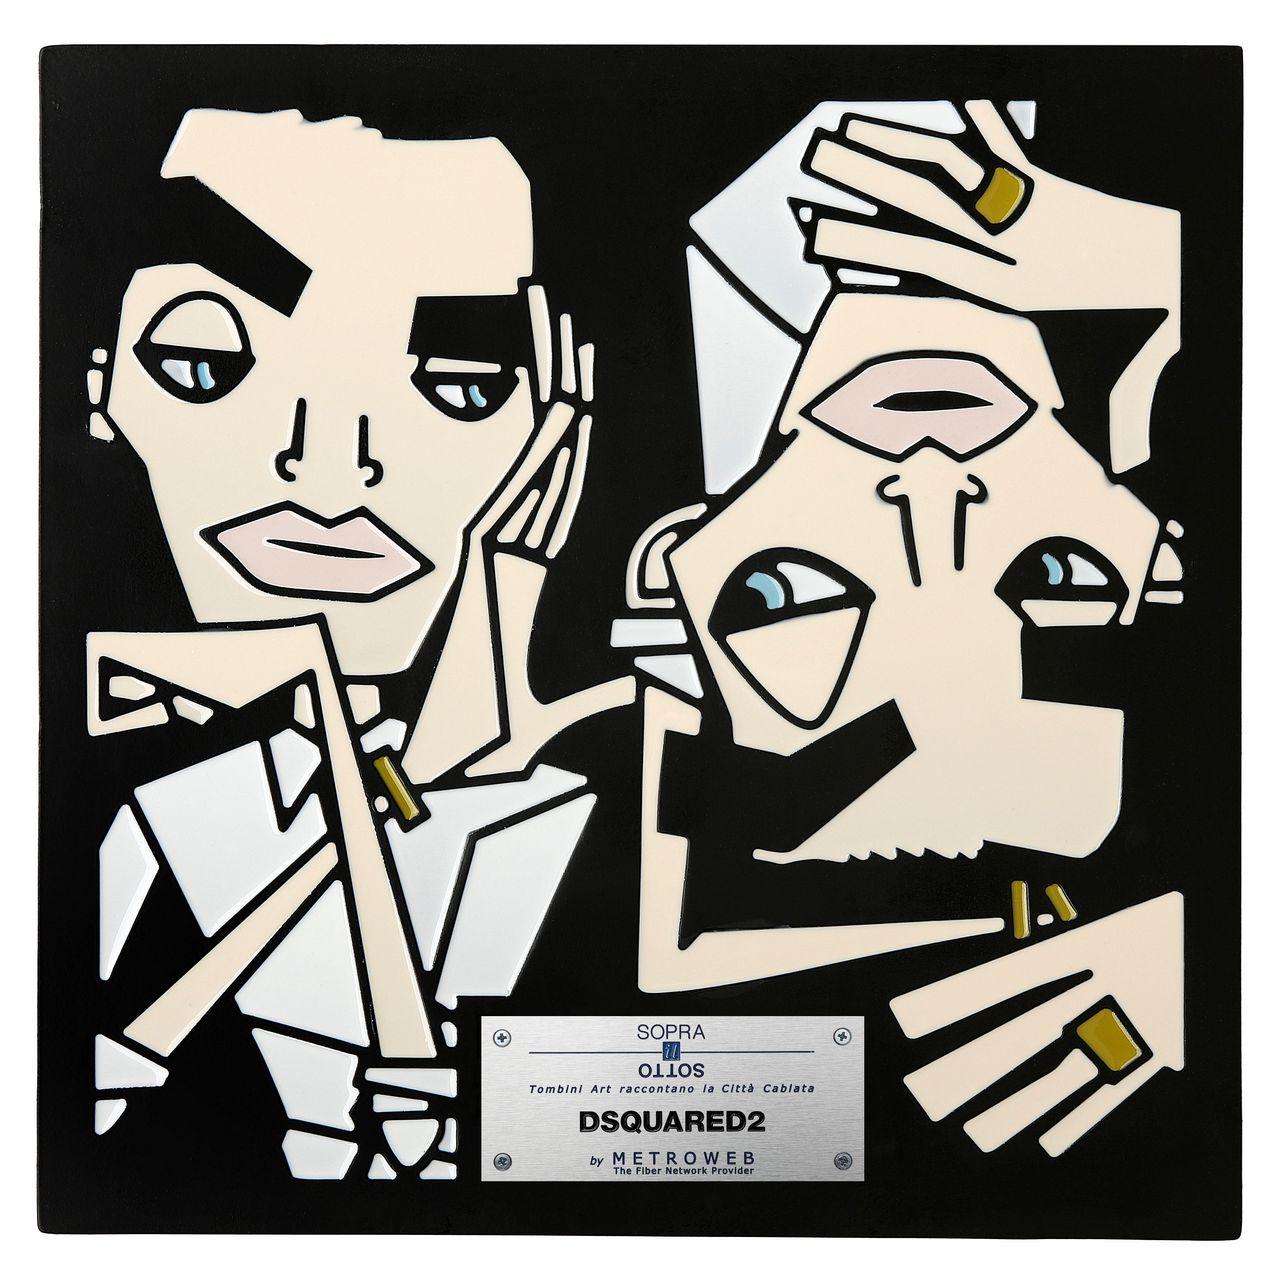 tombino art DSquared2, ph Sergio Caminata